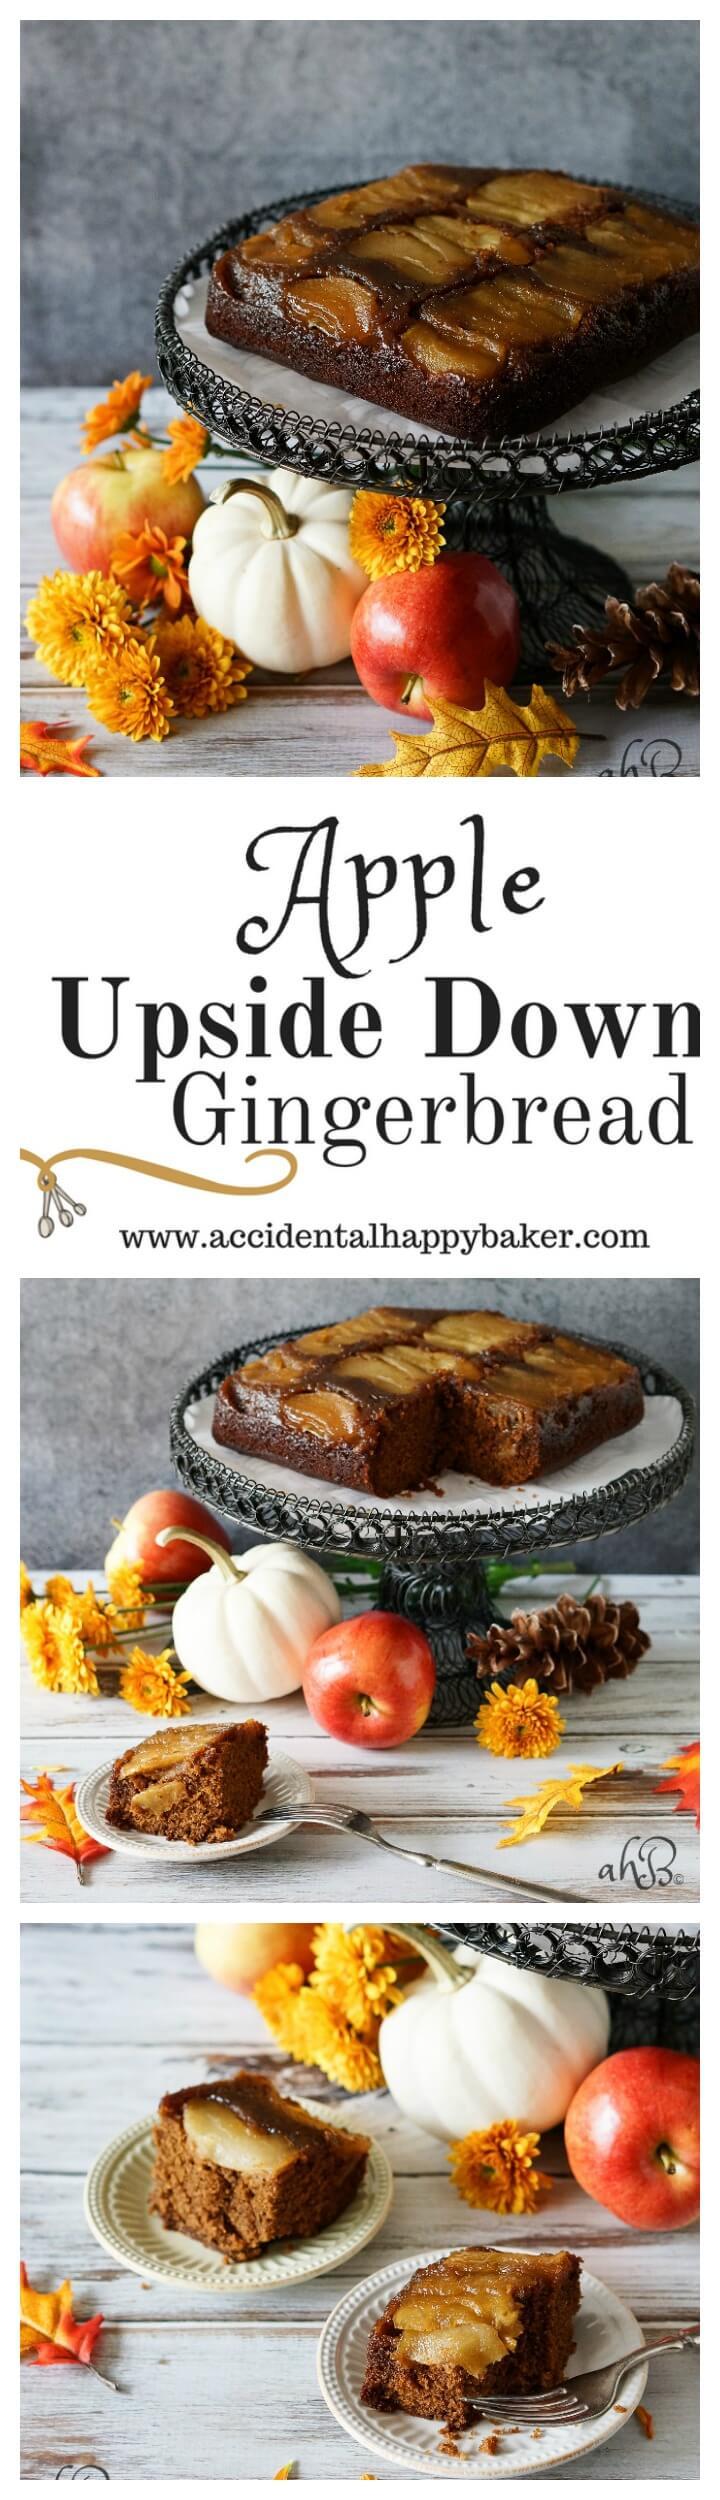 Apple Upside Down Gingerbread